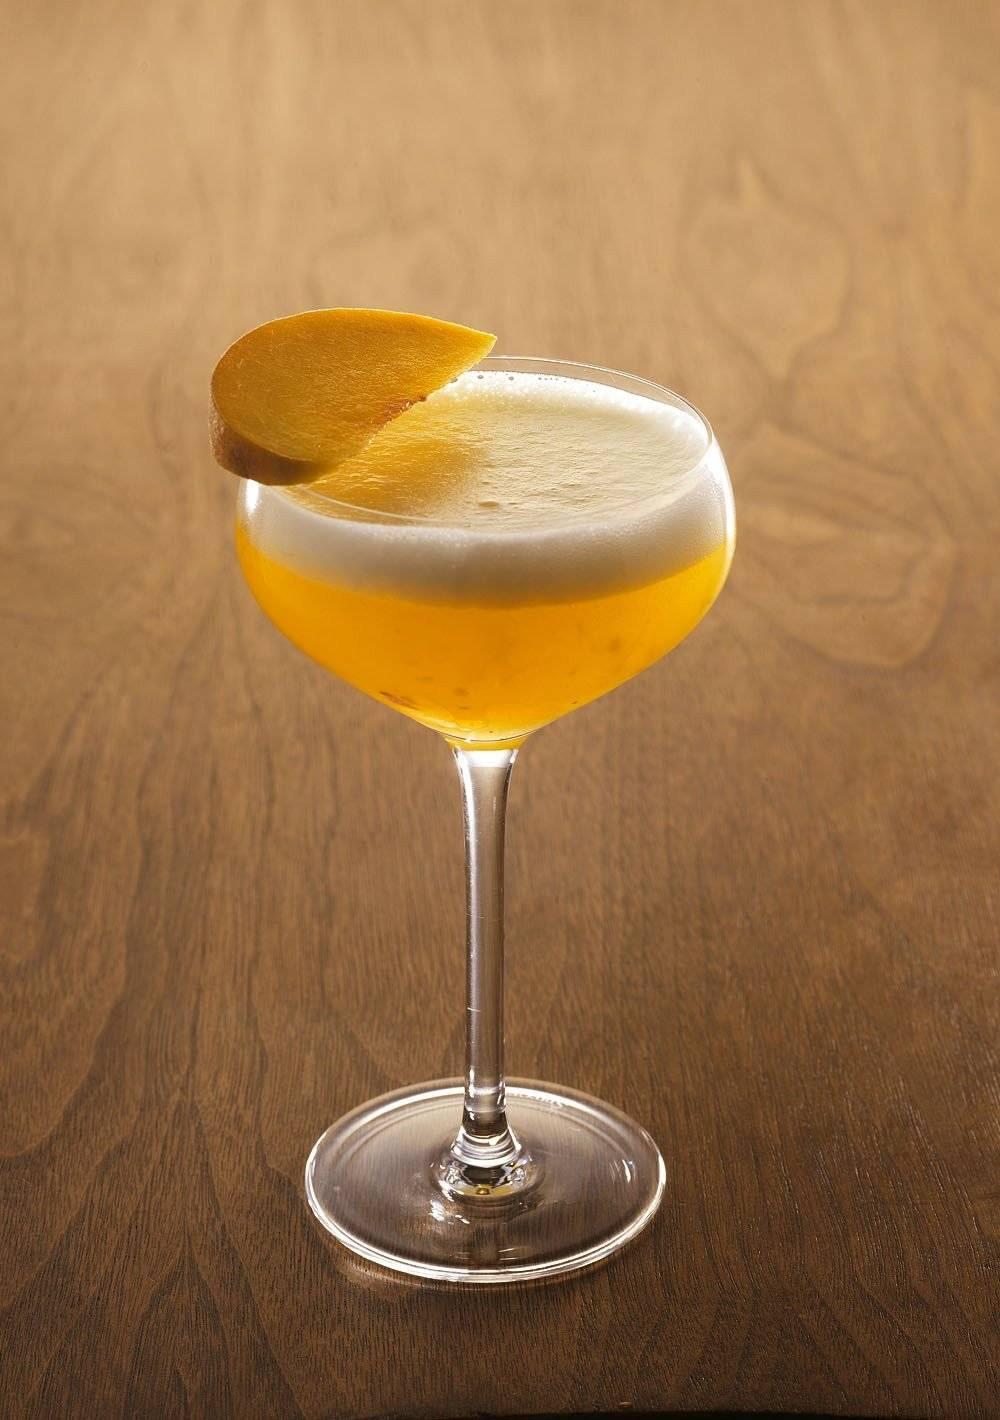 Беллини (коктейль) — википедия. что такое беллини (коктейль)